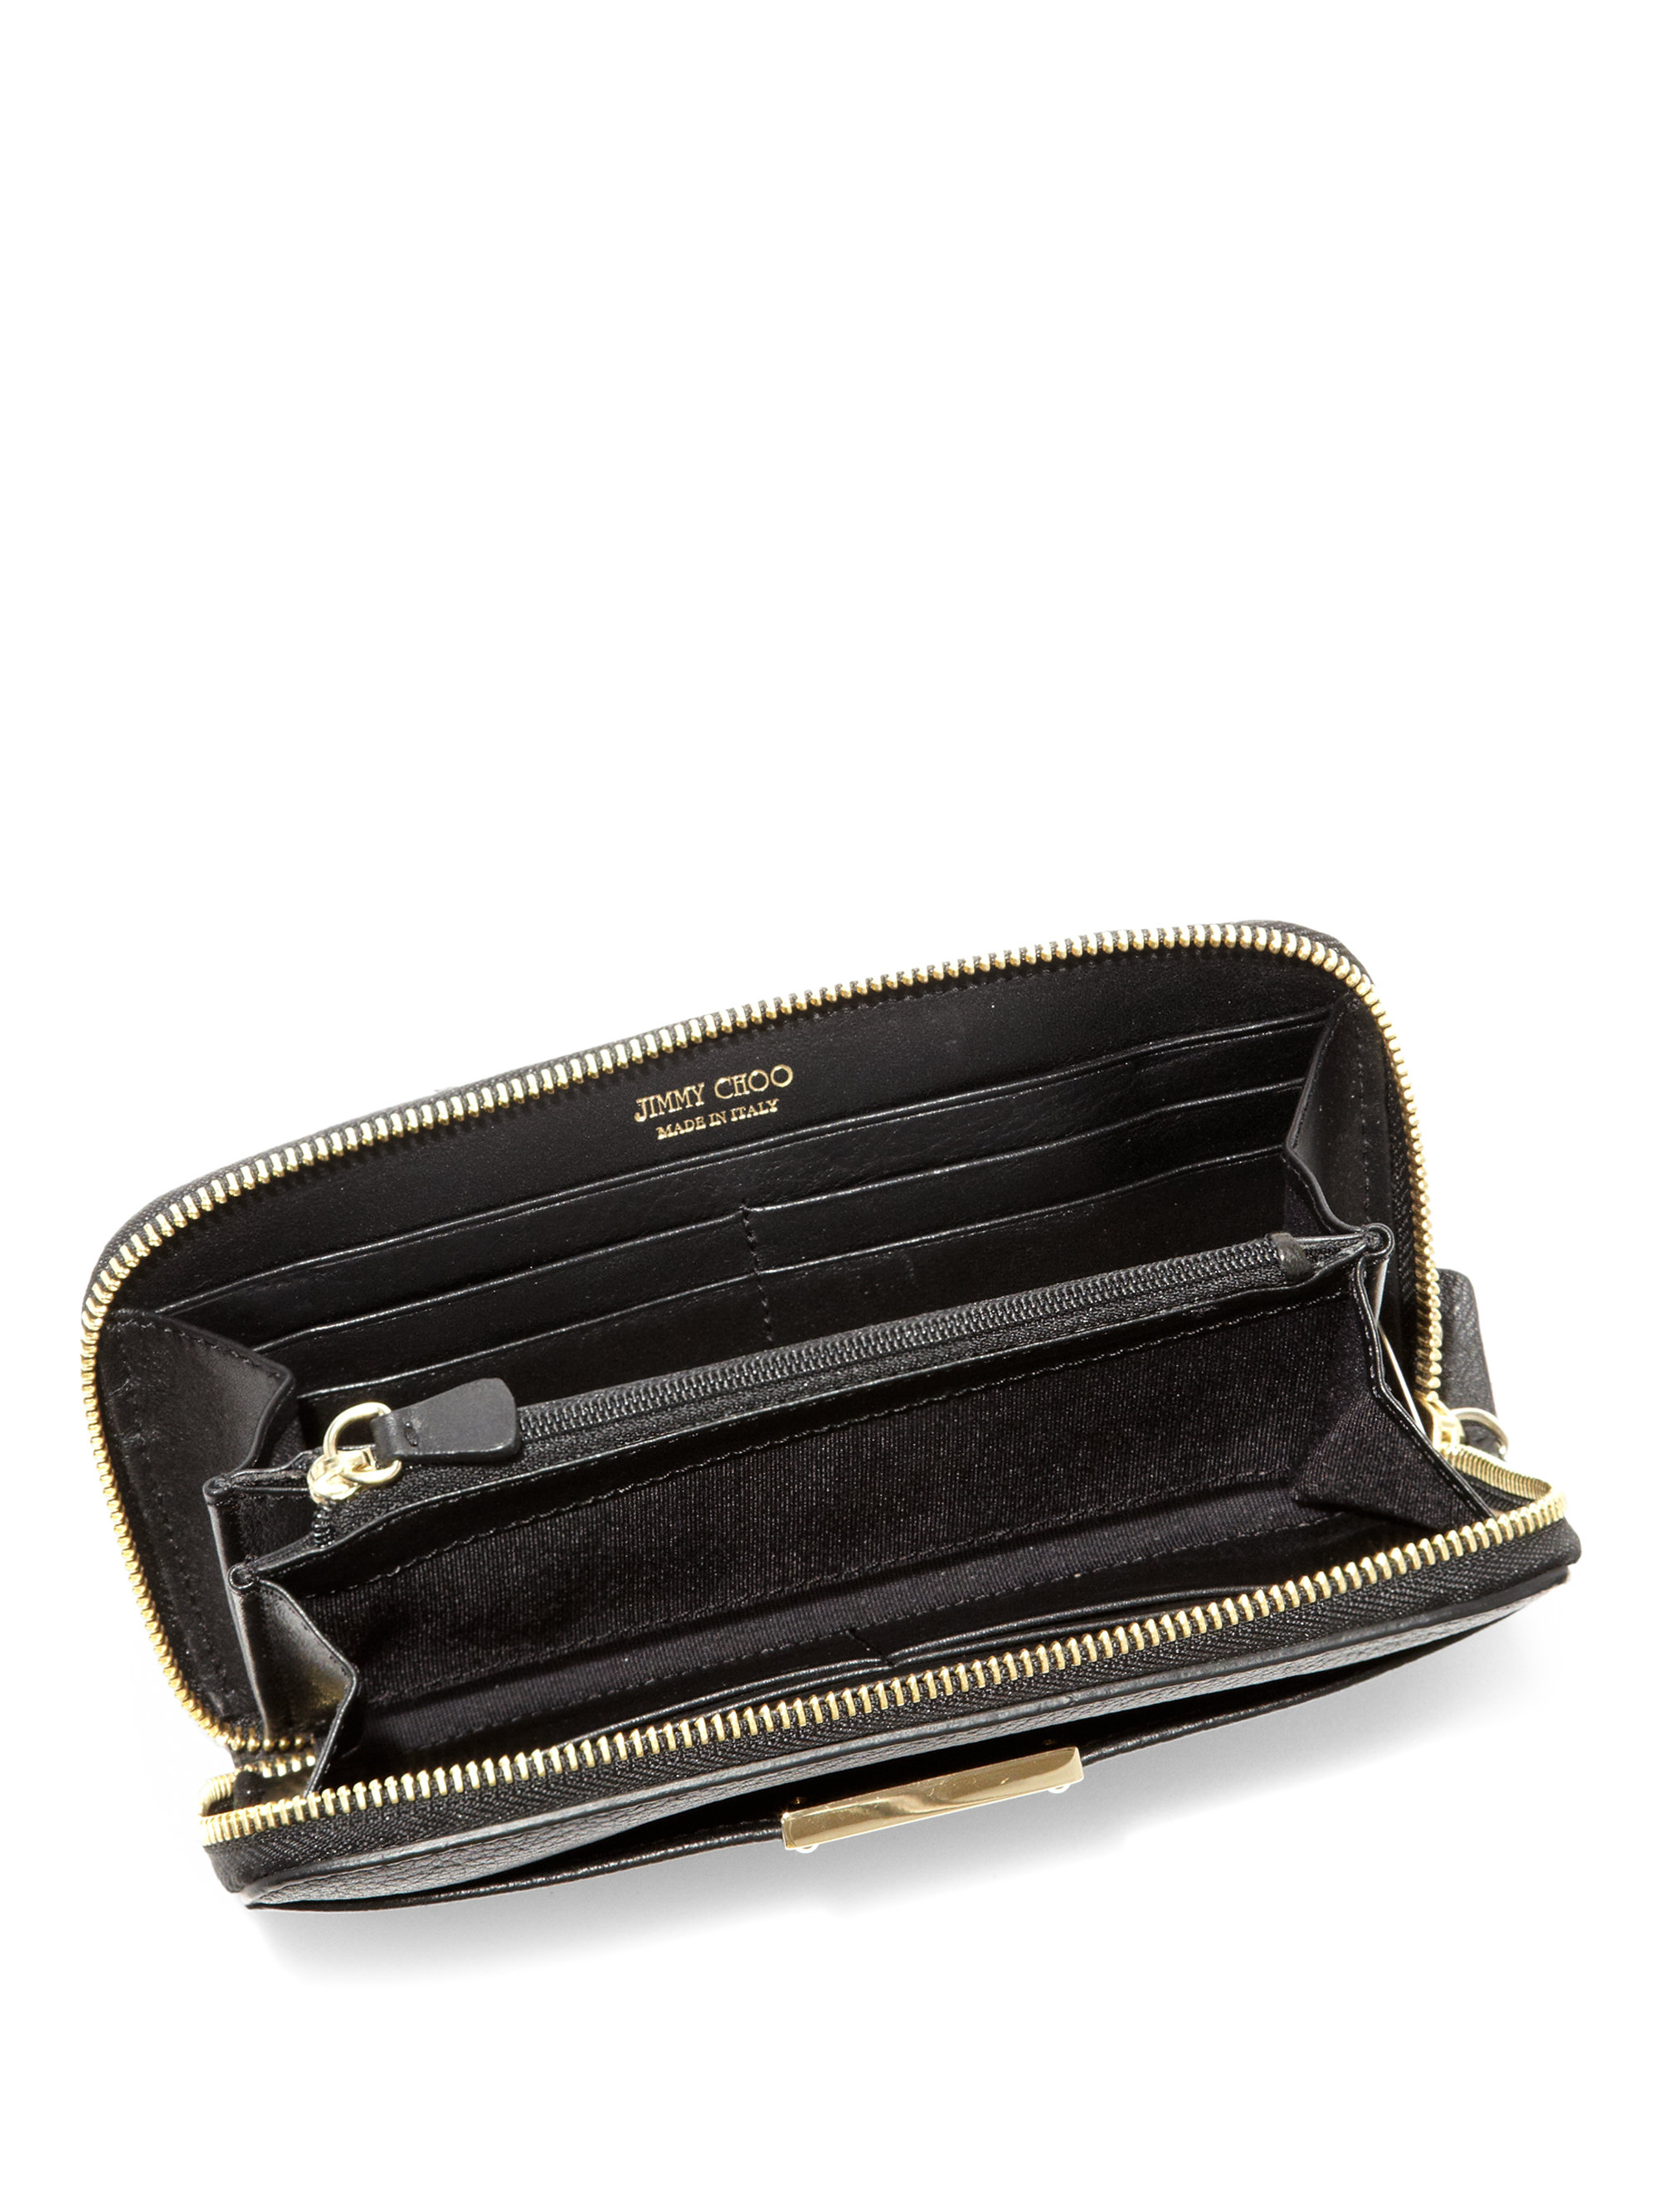 3c41bb4925b Jimmy Choo Rush Leather Zip Continental Wallet In Black Lyst